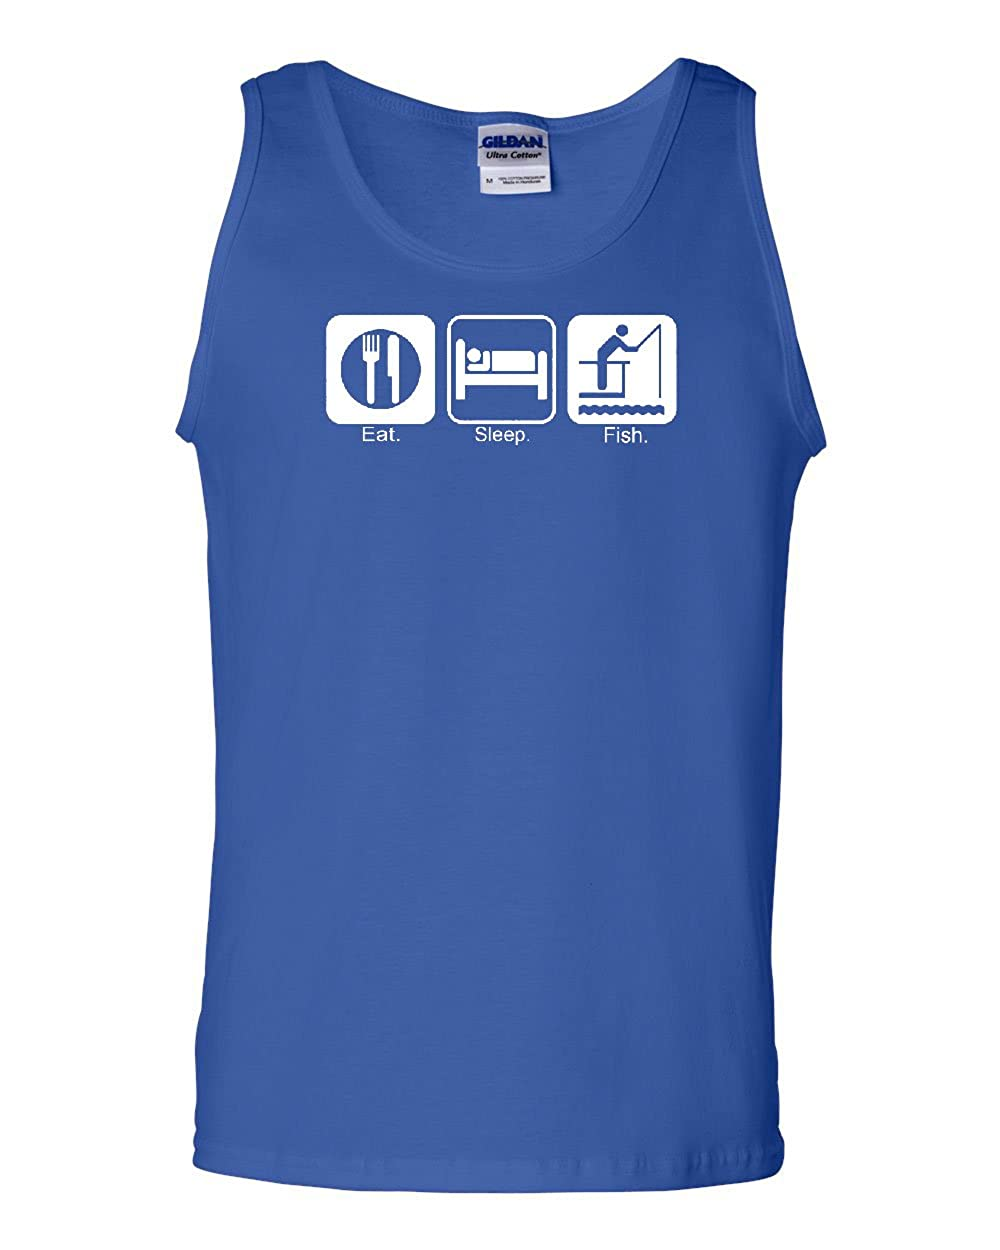 Eat Sleep Fish Tank Top Funny Fishing Camping Muscle Shirt